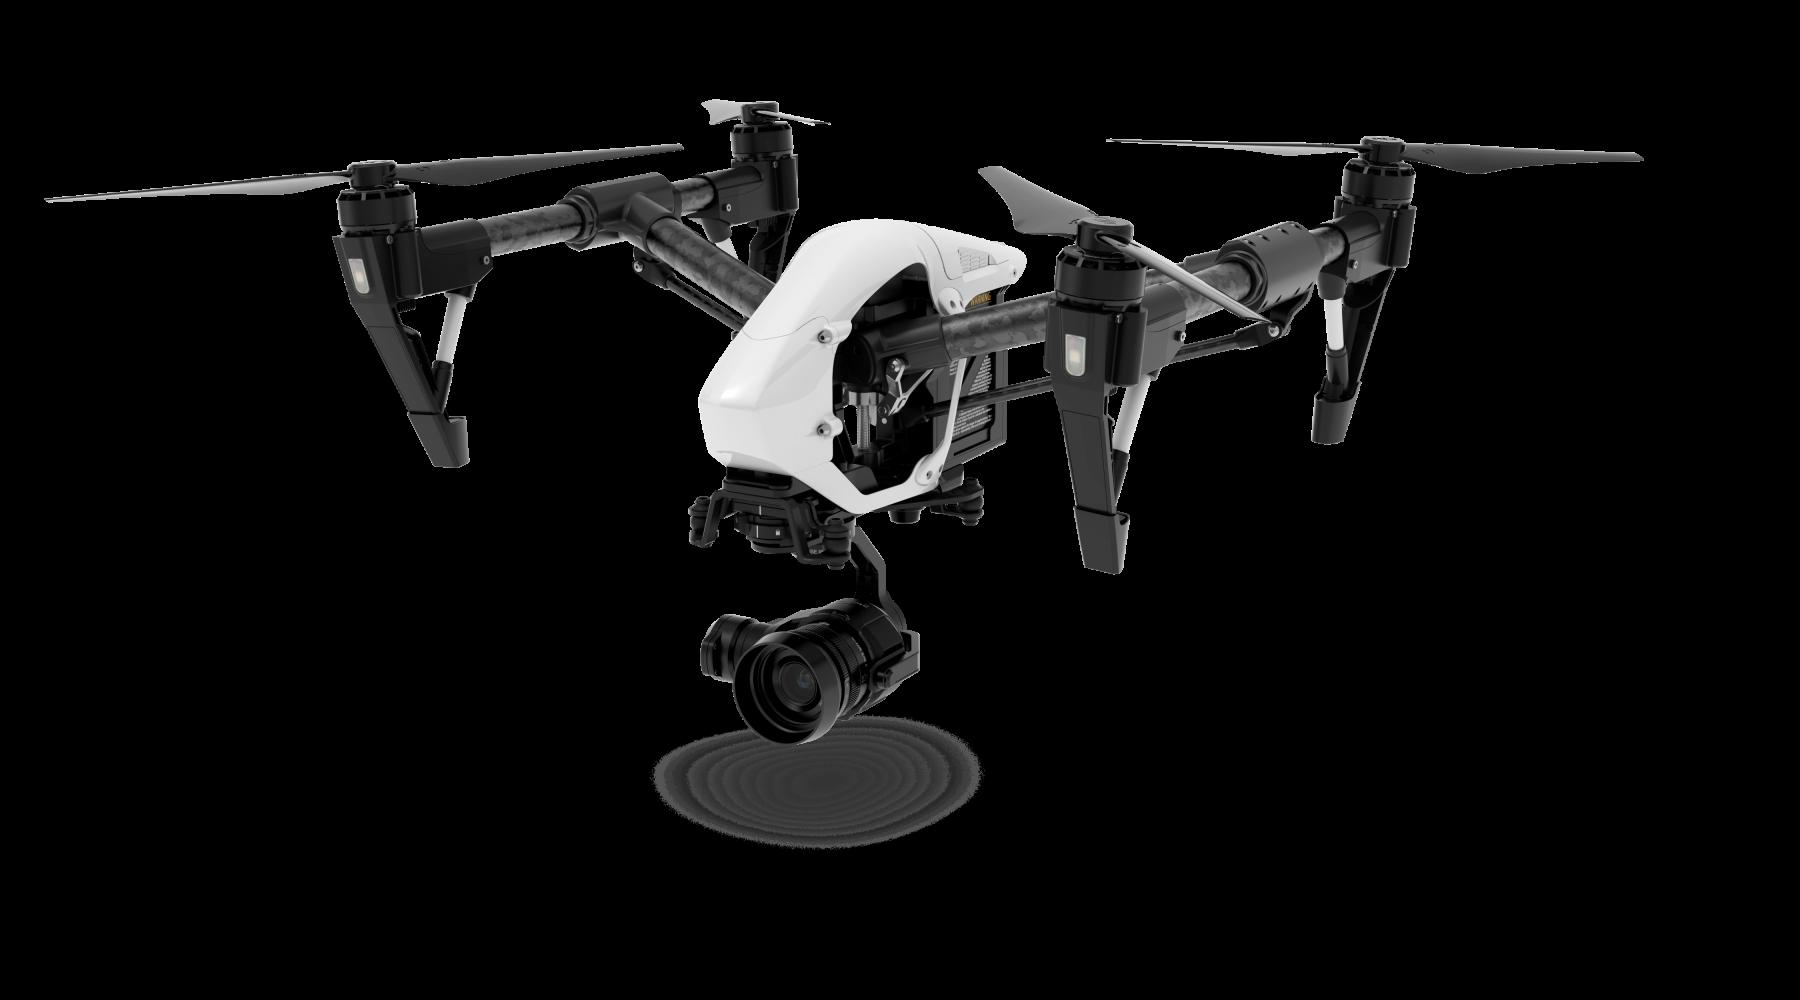 Квадрокоптер с камерой DJI Inspire 1 Pro - 2